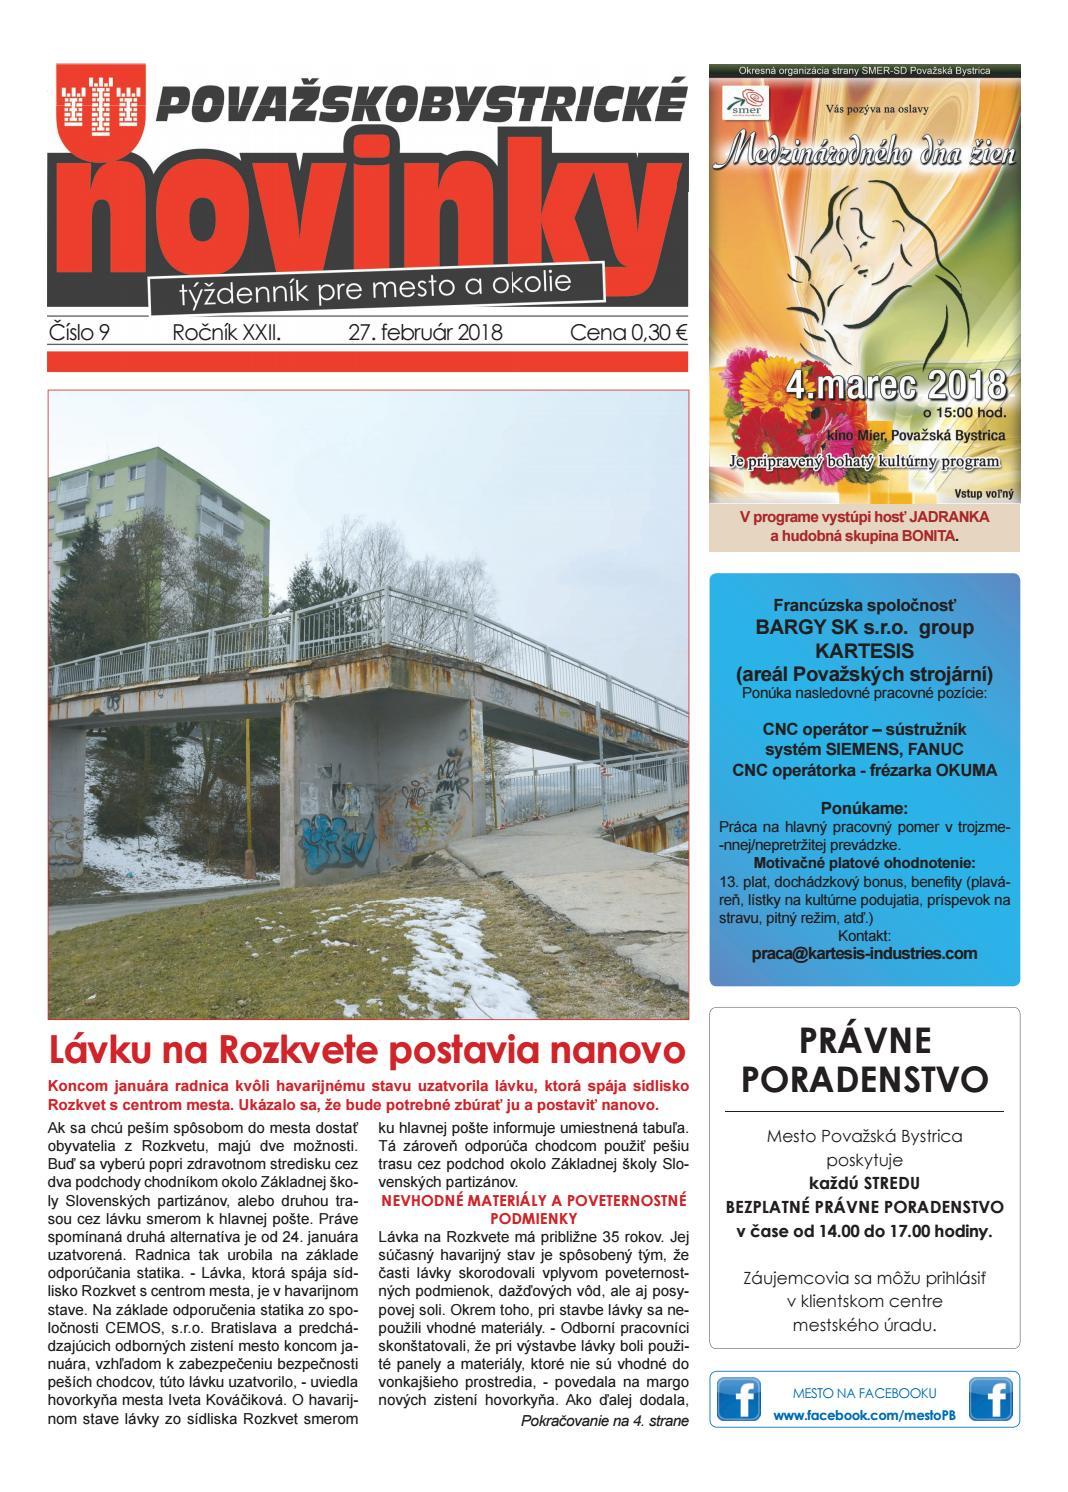 0791c9548 Považskobystrické novinky č. 9/2018 by Považskobystrické novinky - issuu